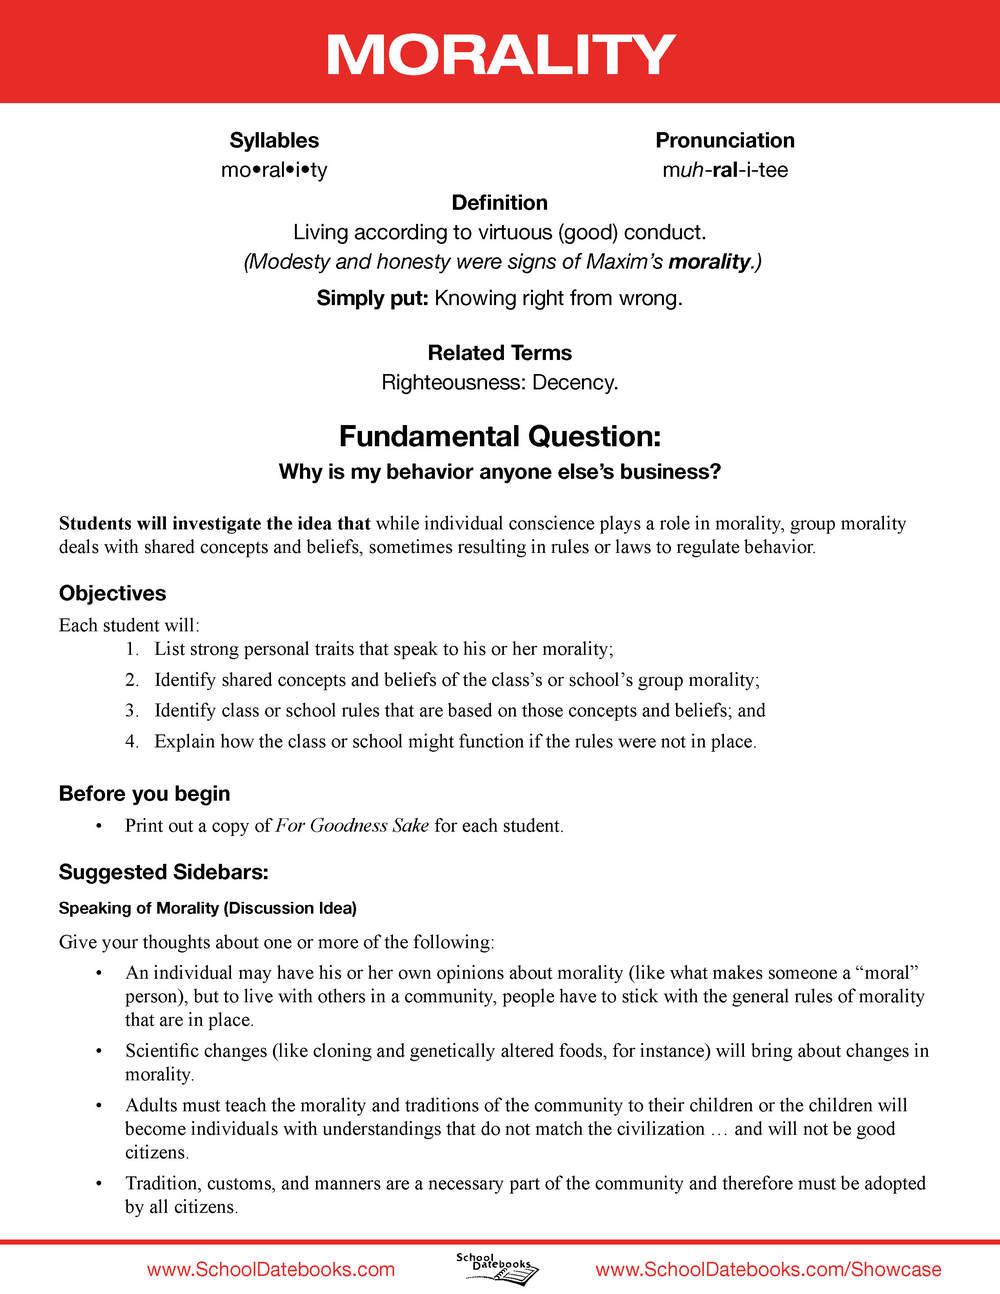 LessonPlan-Moral_Page_1.jpg